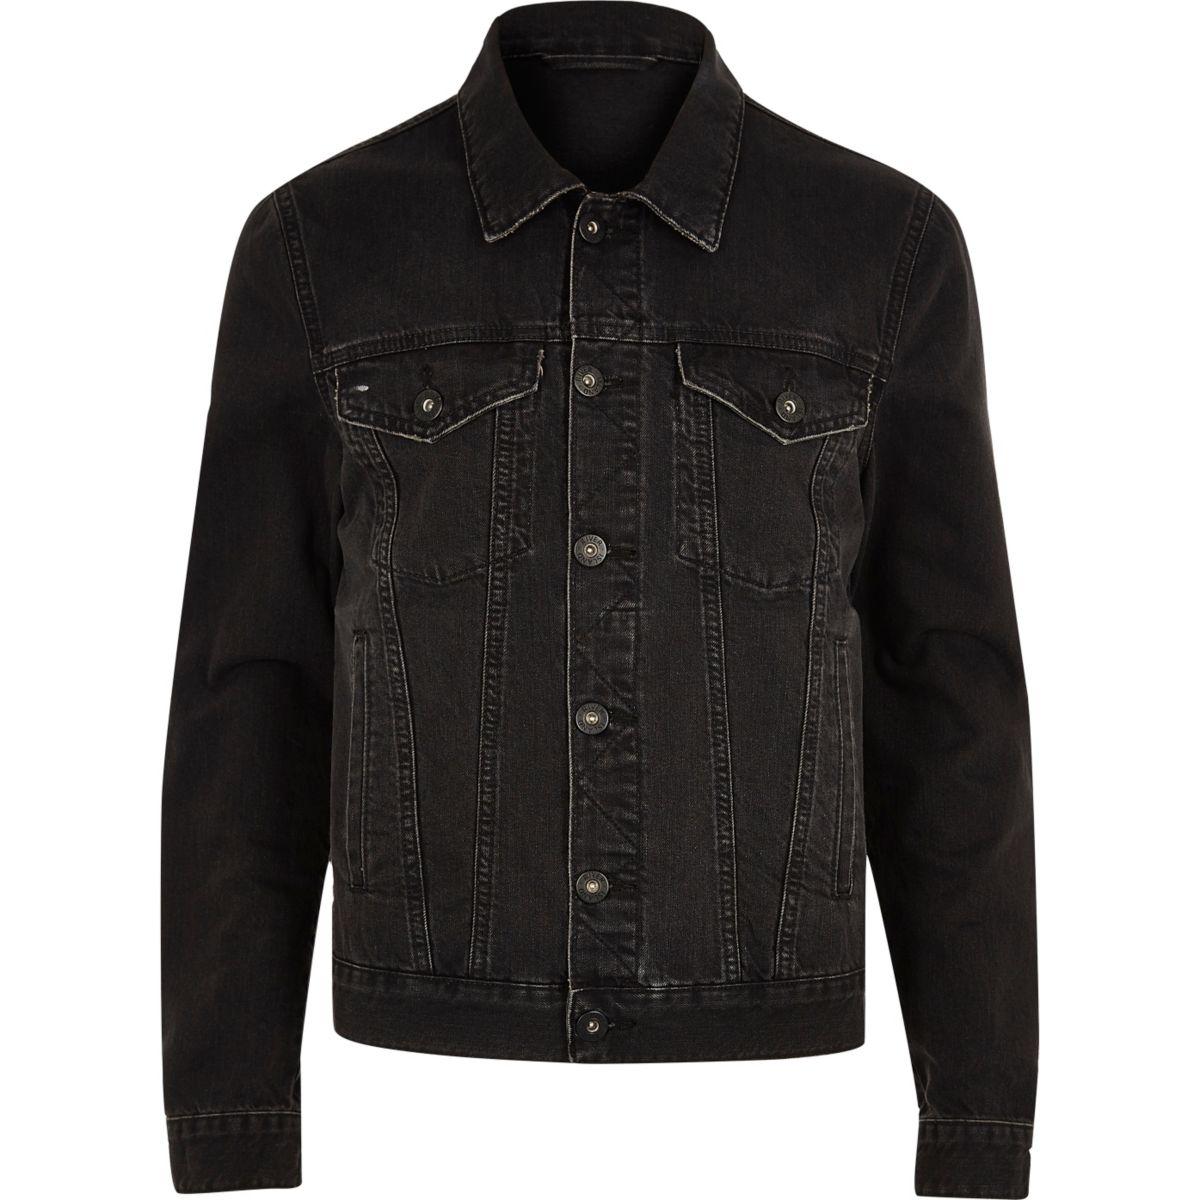 Black wash distressed denim jacket